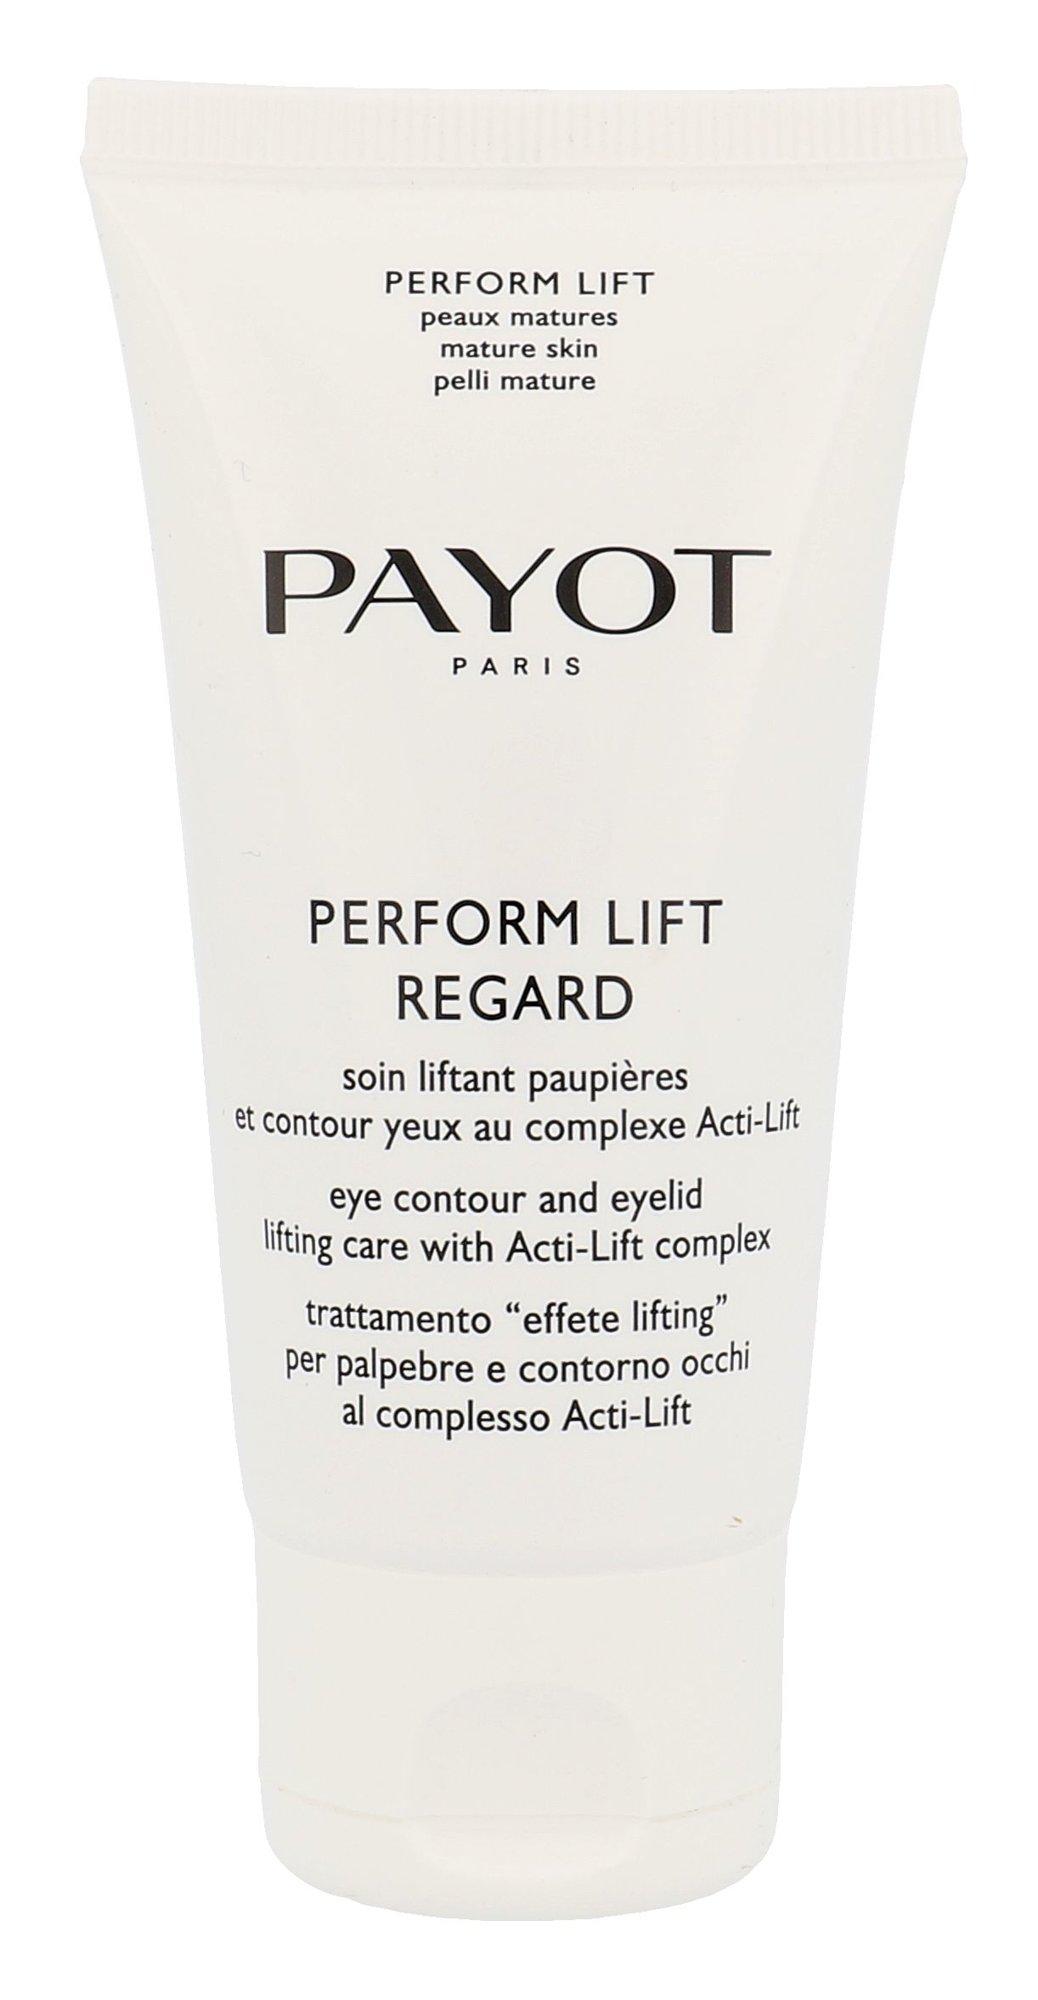 PAYOT Perform Lift Cosmetic 15ml  Regard